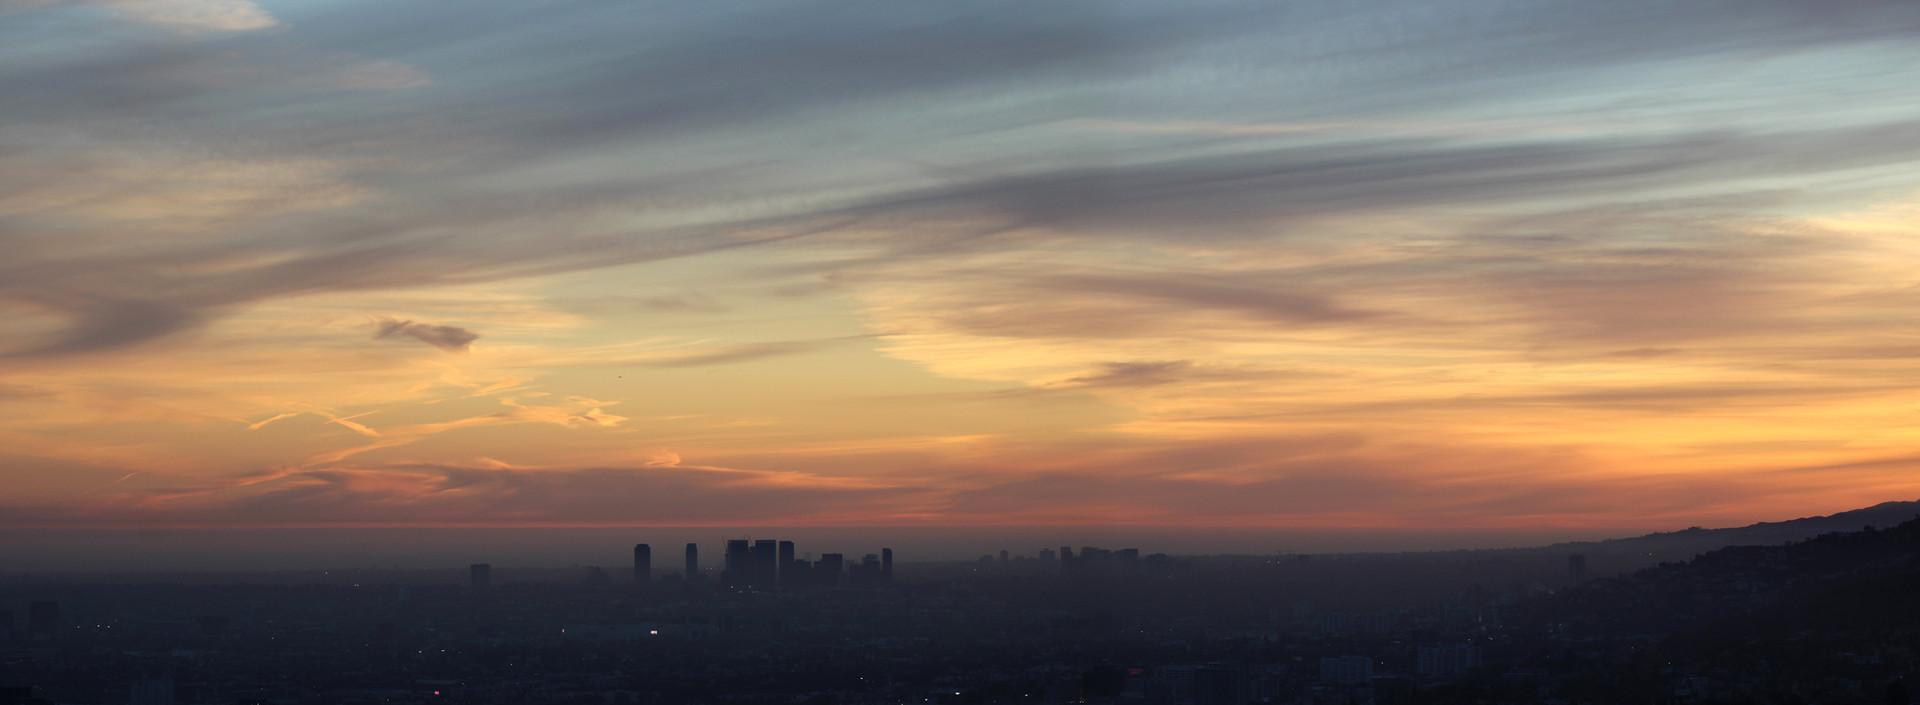 Los Angeles, California, USA 1